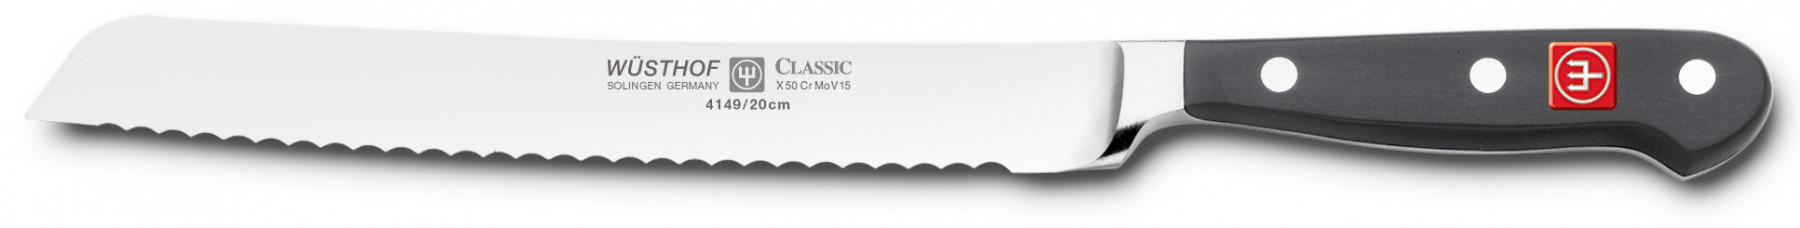 Wüsthof Dreizack Messerset Classic I 3tlg. Brotmesser